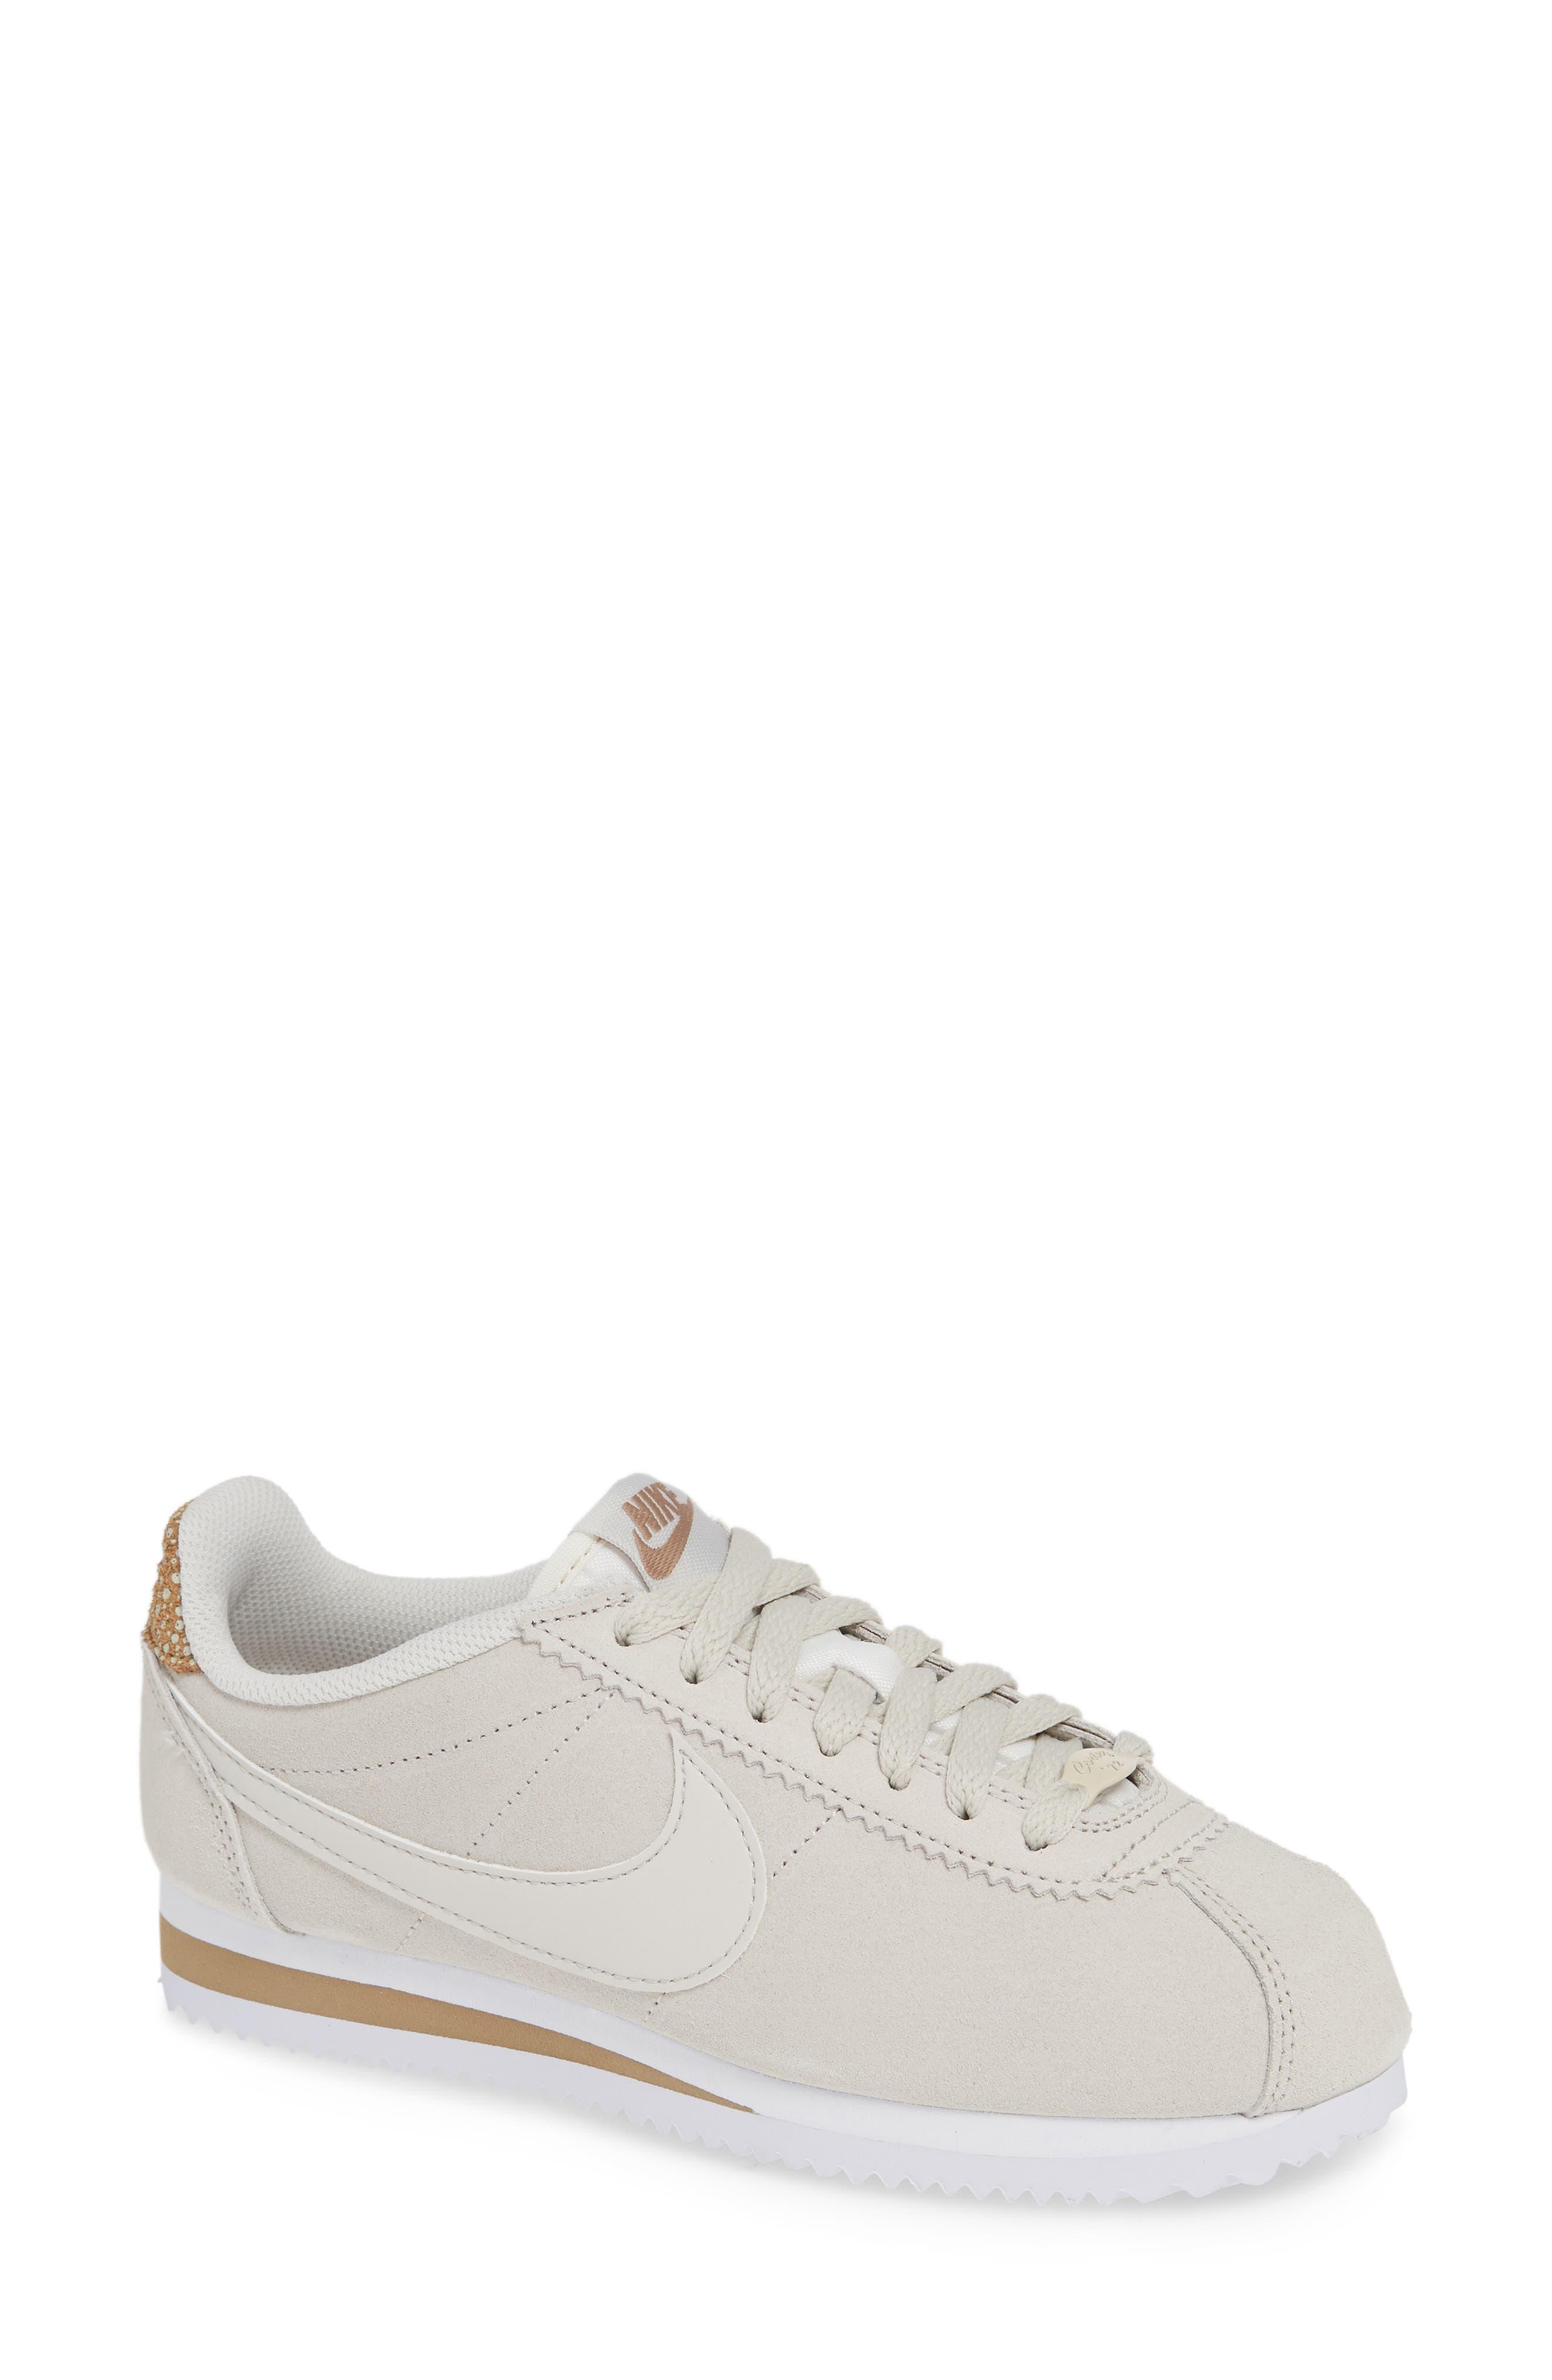 Classic Cortez Premium Sneaker,                             Main thumbnail 1, color,                             LIGHT BONE/ CANTEEN